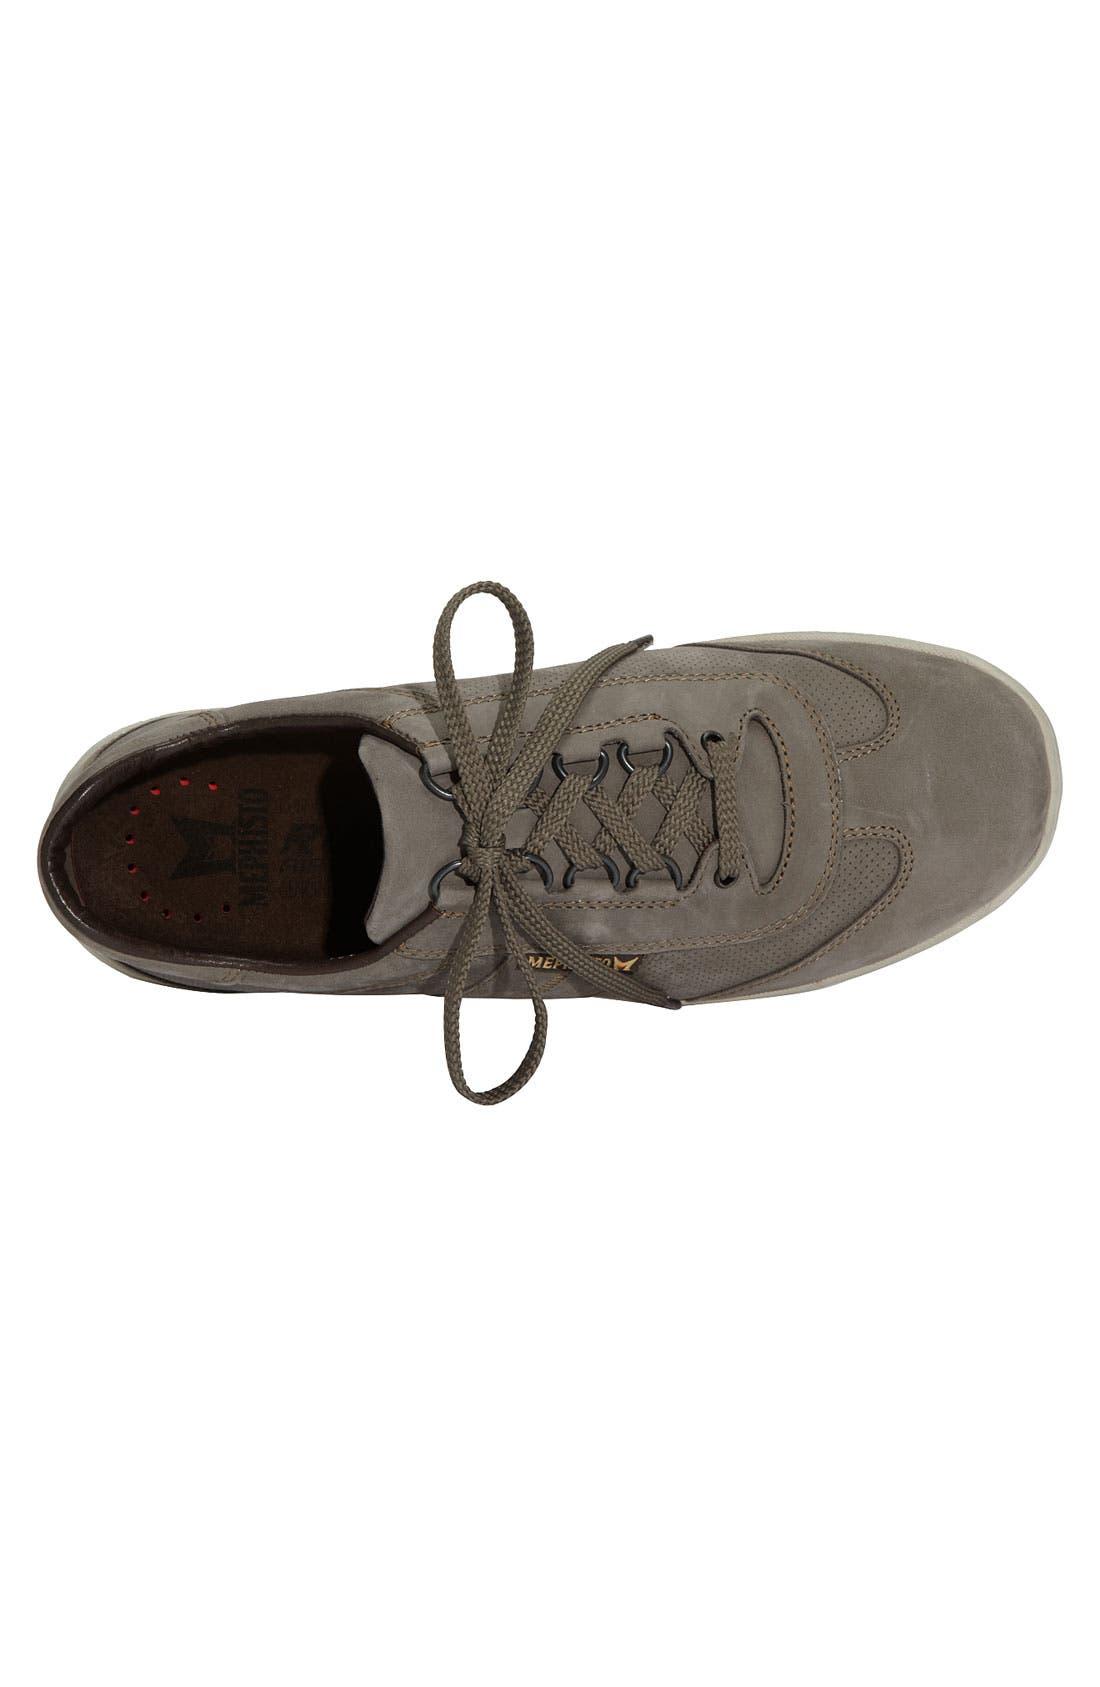 'Hike' Perforated Walking Shoe,                             Alternate thumbnail 2, color,                             020